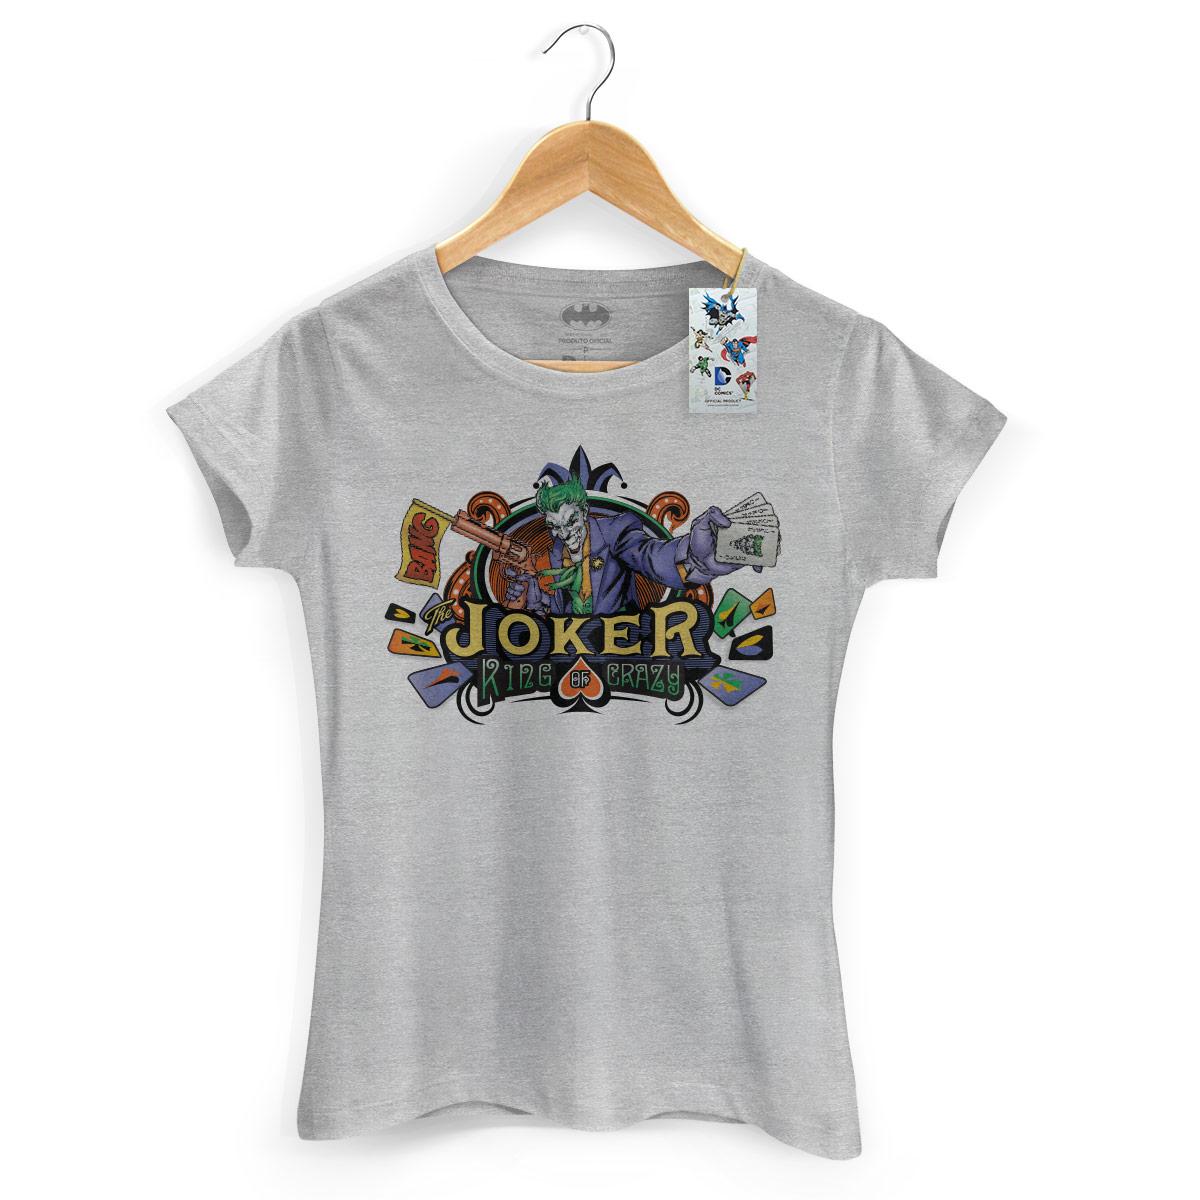 Camiseta Feminina The Joker King Of Crazy